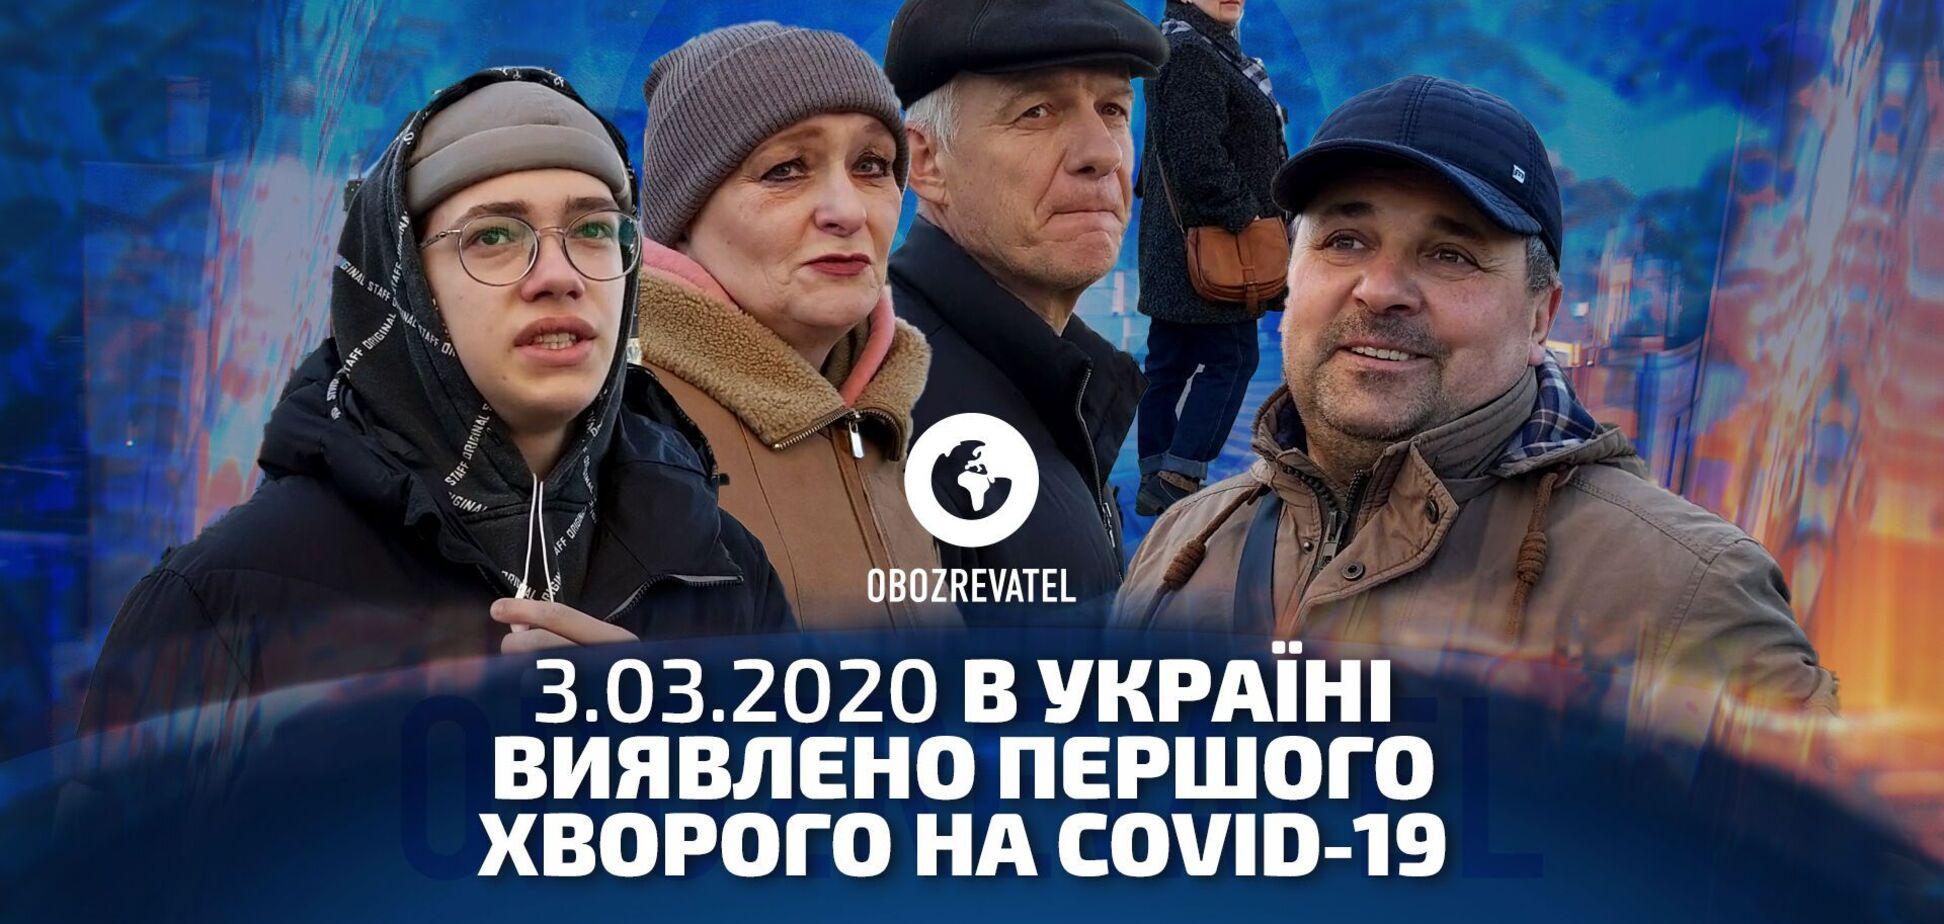 COVID-19 в Украине: год спустя